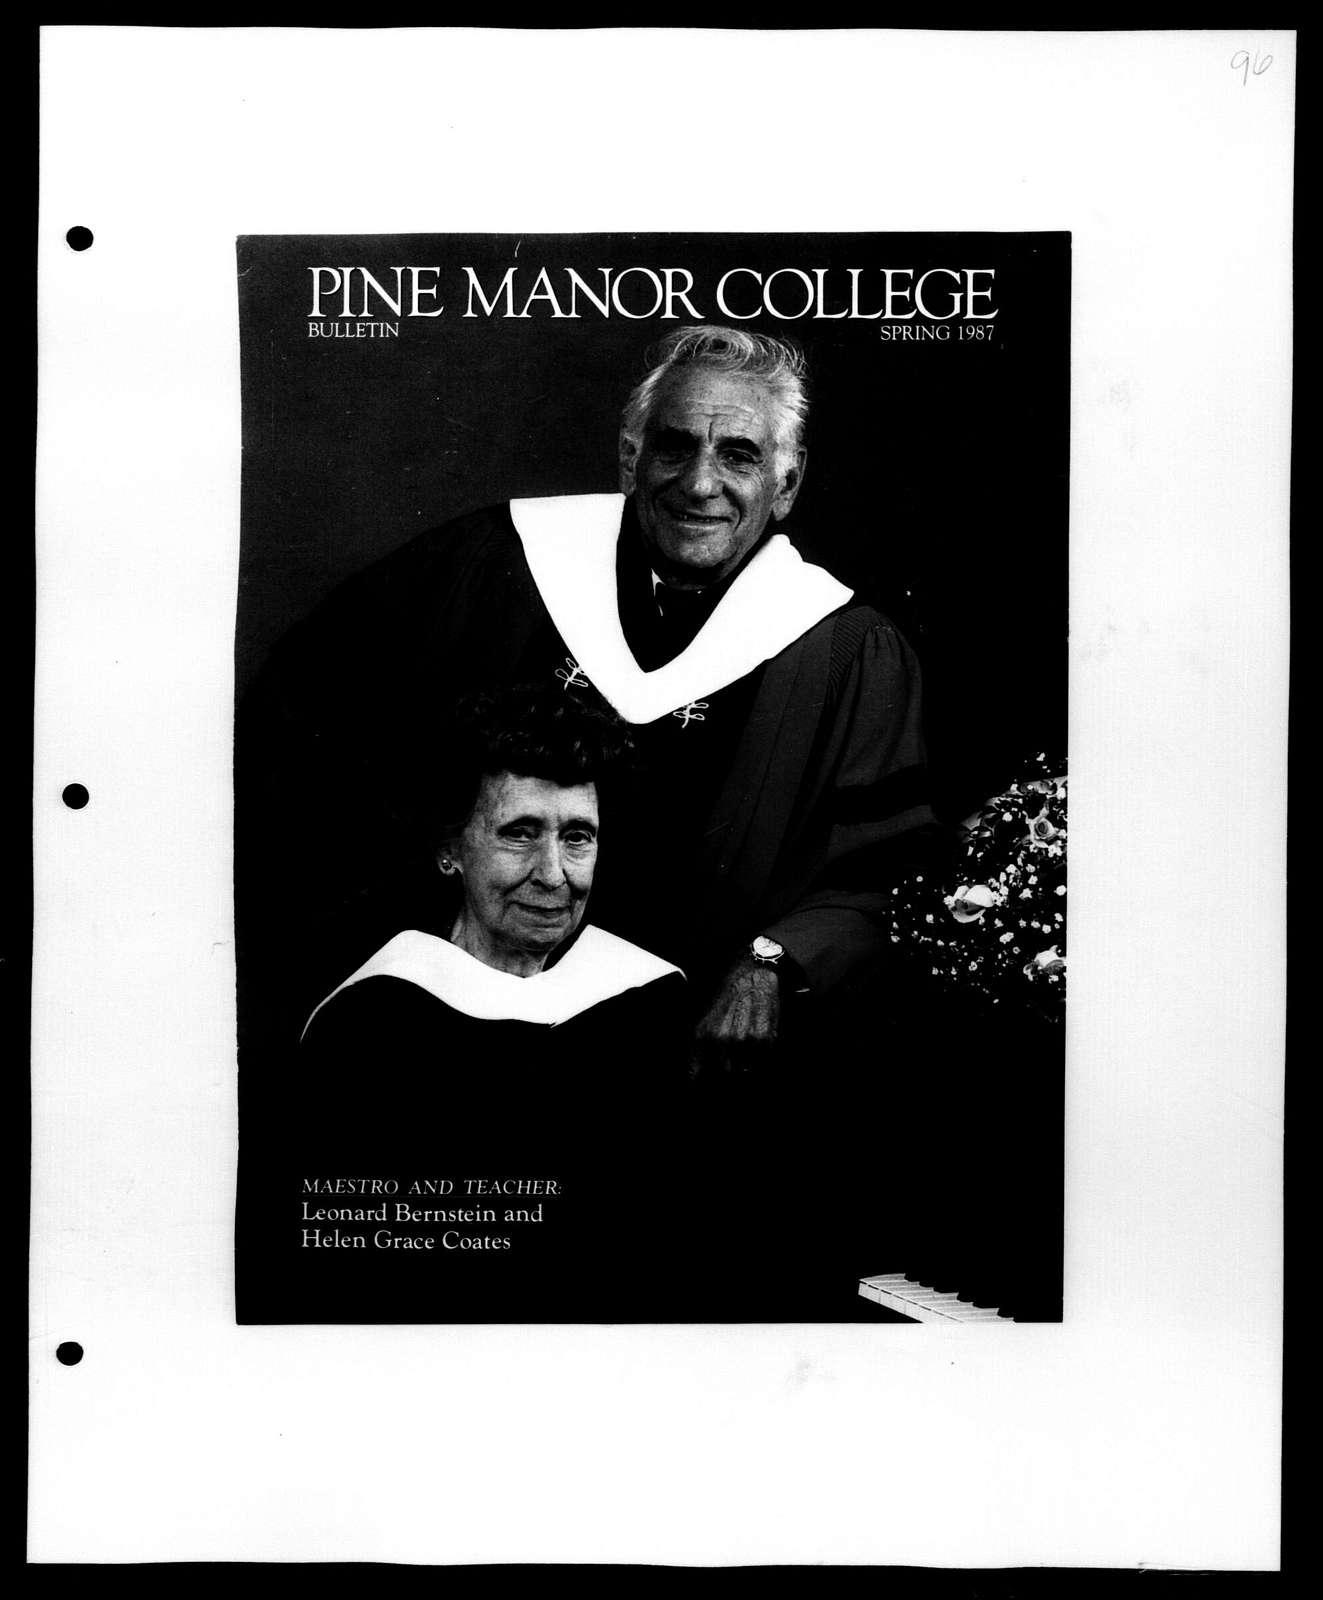 Leonard Bernstein Scrapbook: Vol. 118. Oct. 19, 1986-April 1, 1987